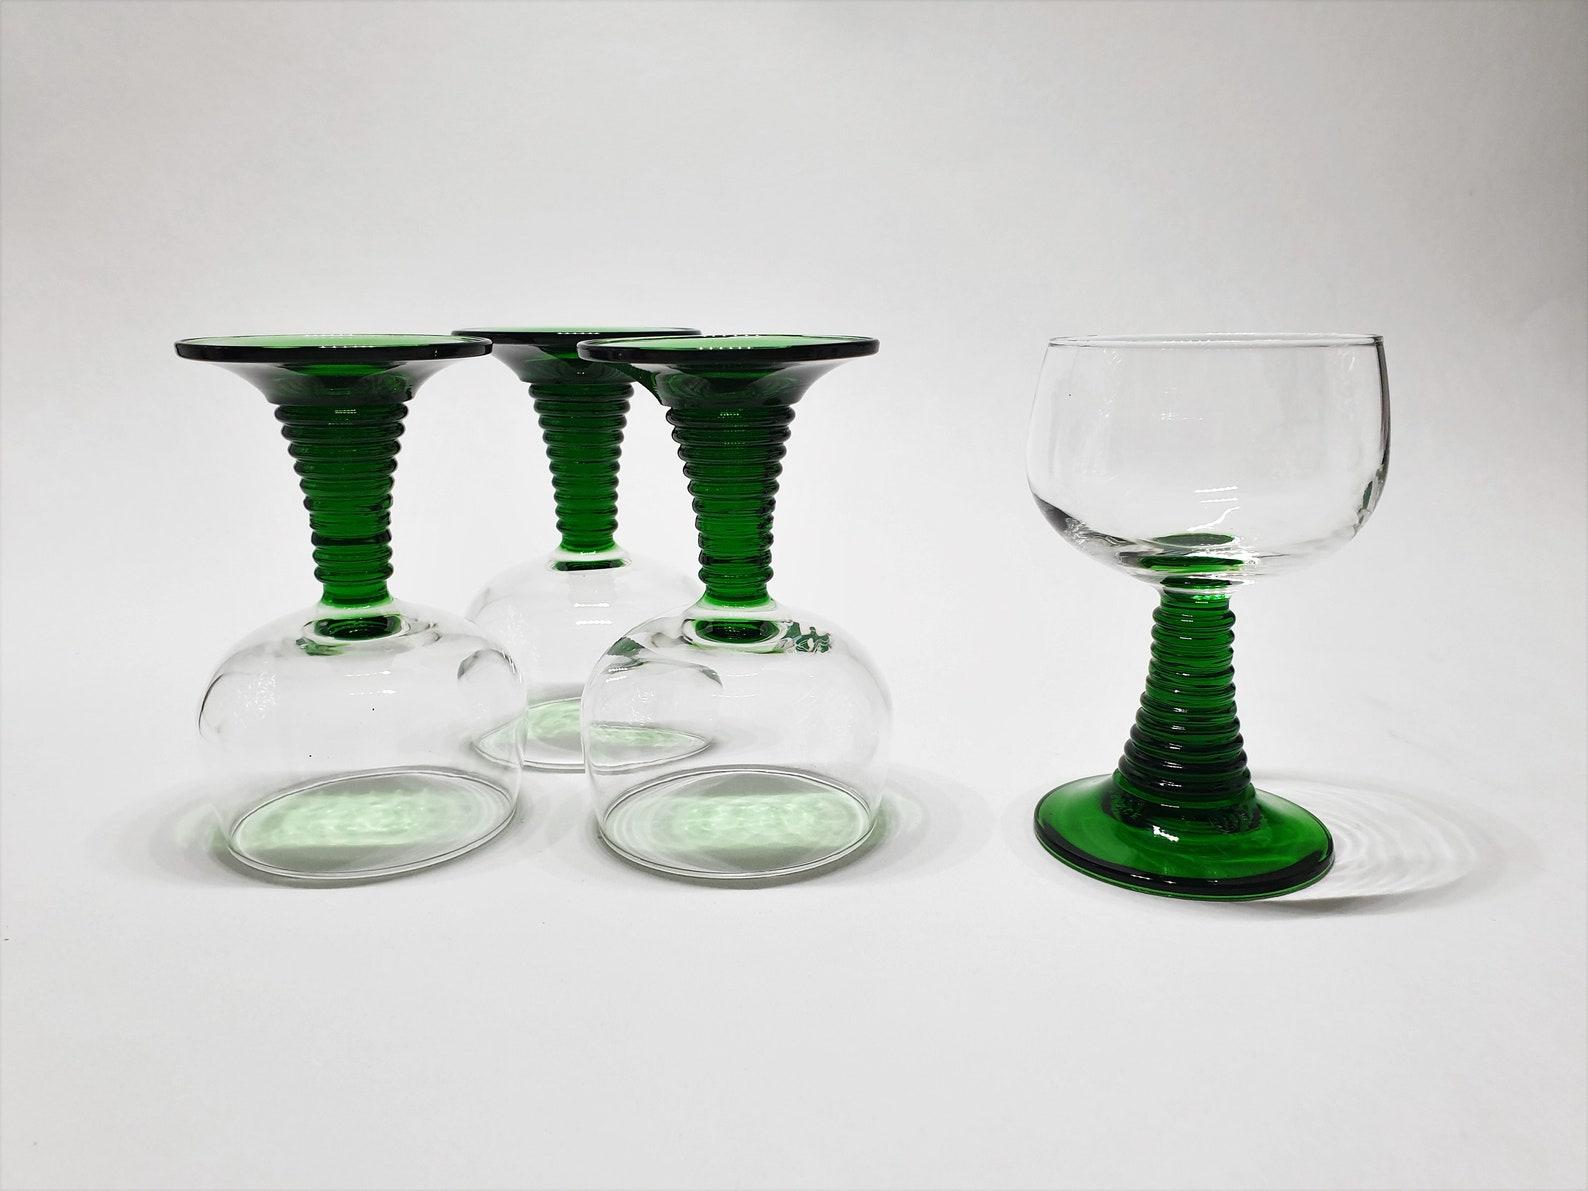 4 Beautiful Roemer Wine Glasses4 Beautiful Roemer Wine Glasses